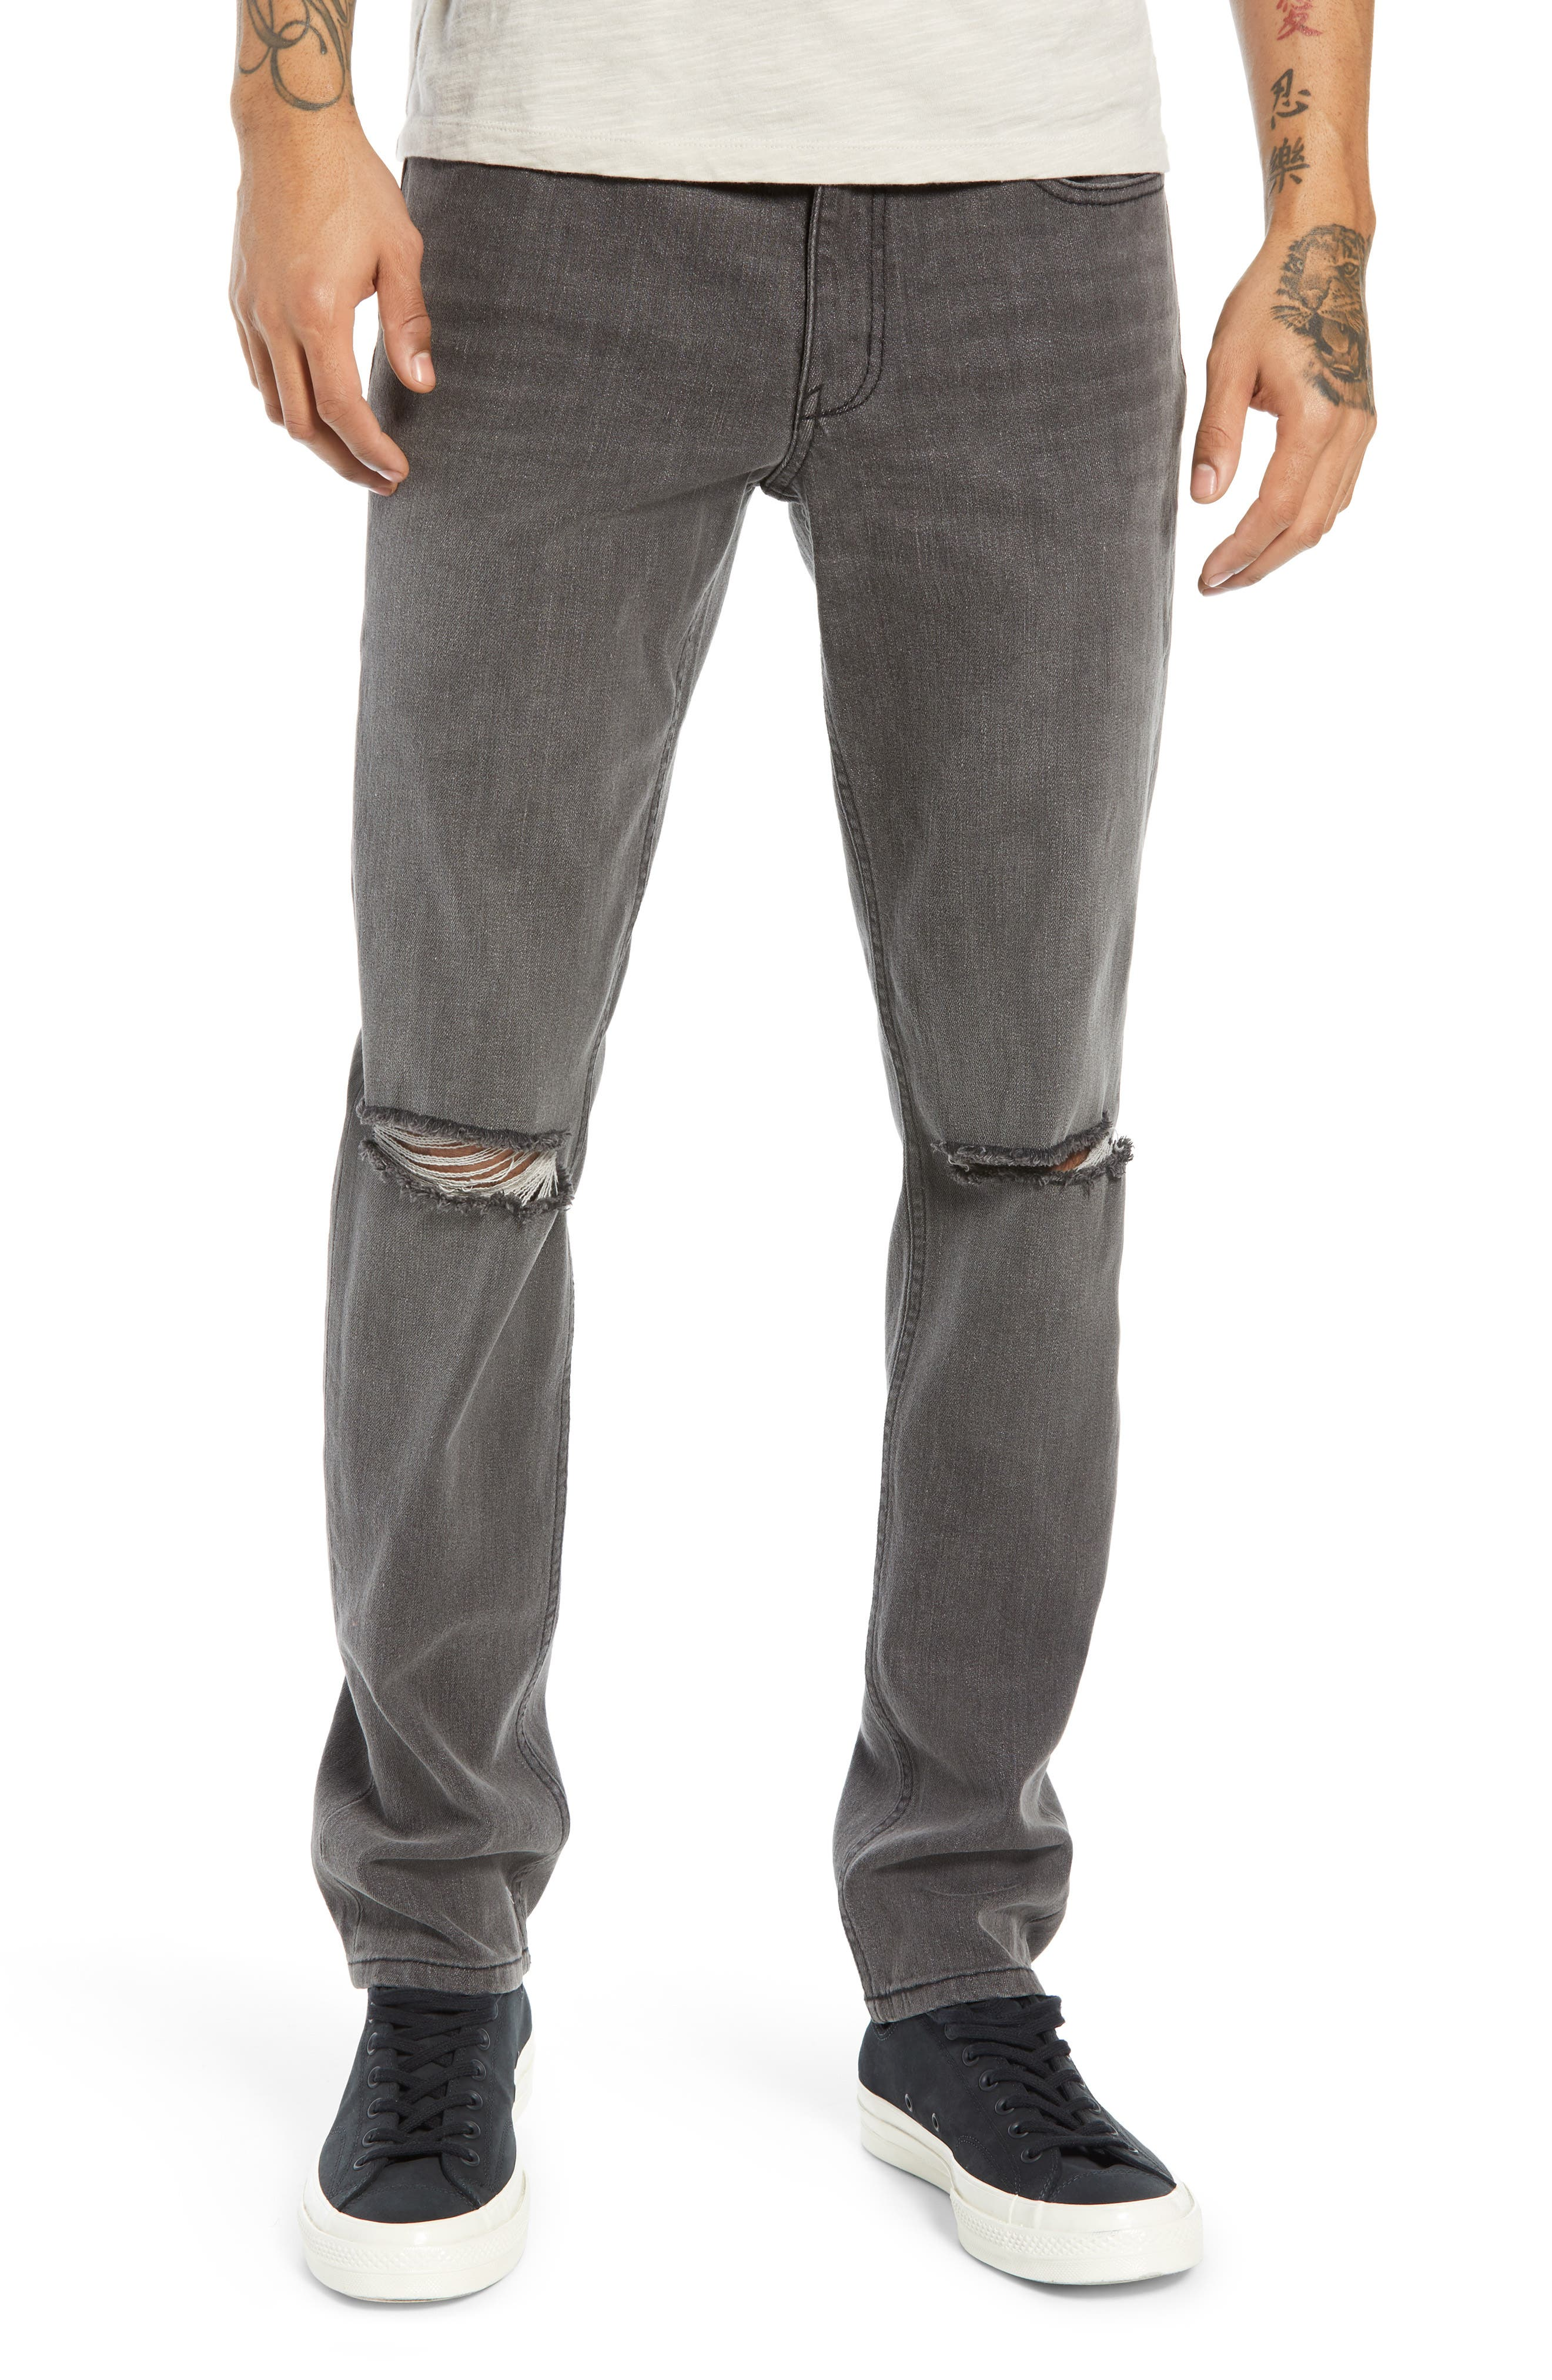 THE RAIL,                             Ripped Skinny Jeans,                             Main thumbnail 1, color,                             GREY CHRIS WASH